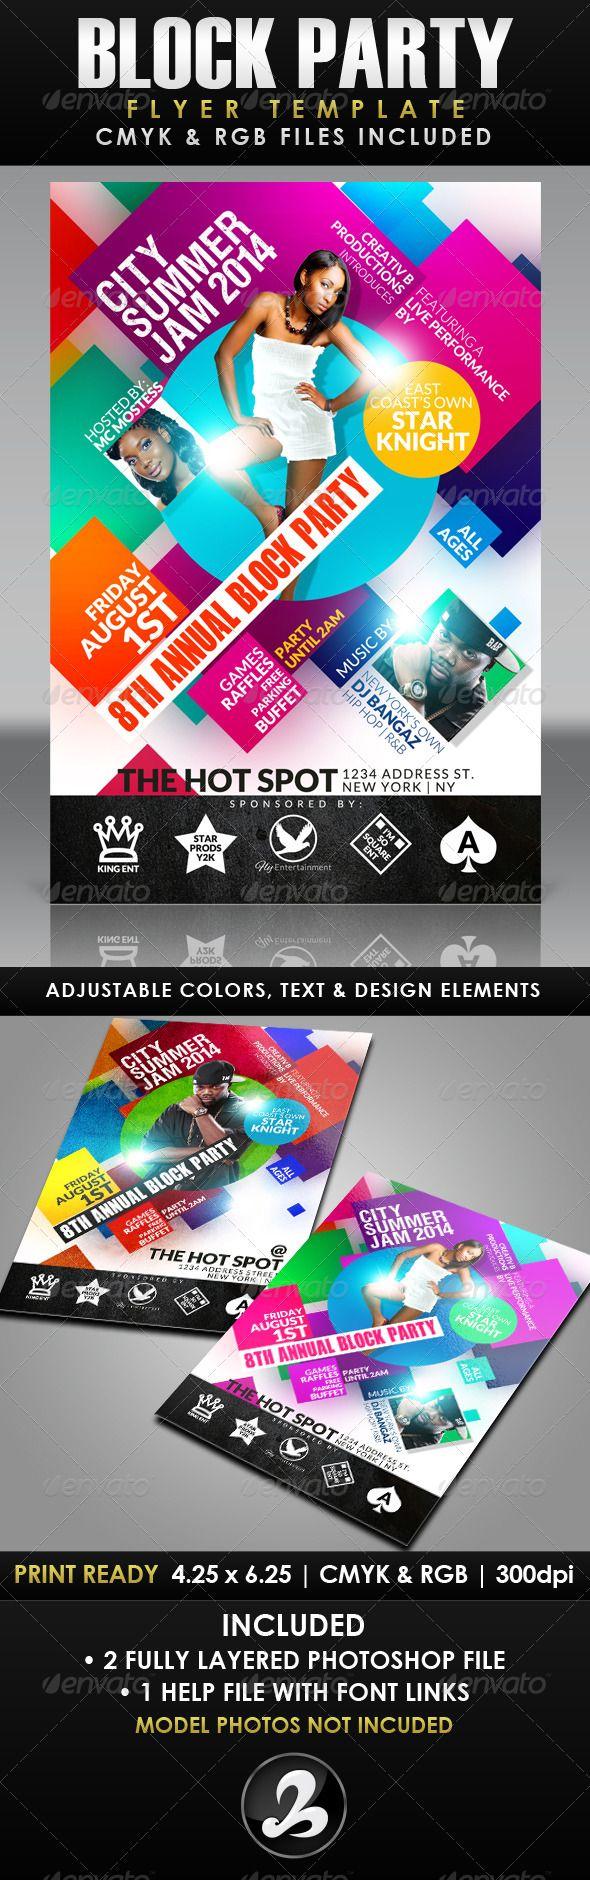 block party flyer template events flyers листовки pinterest